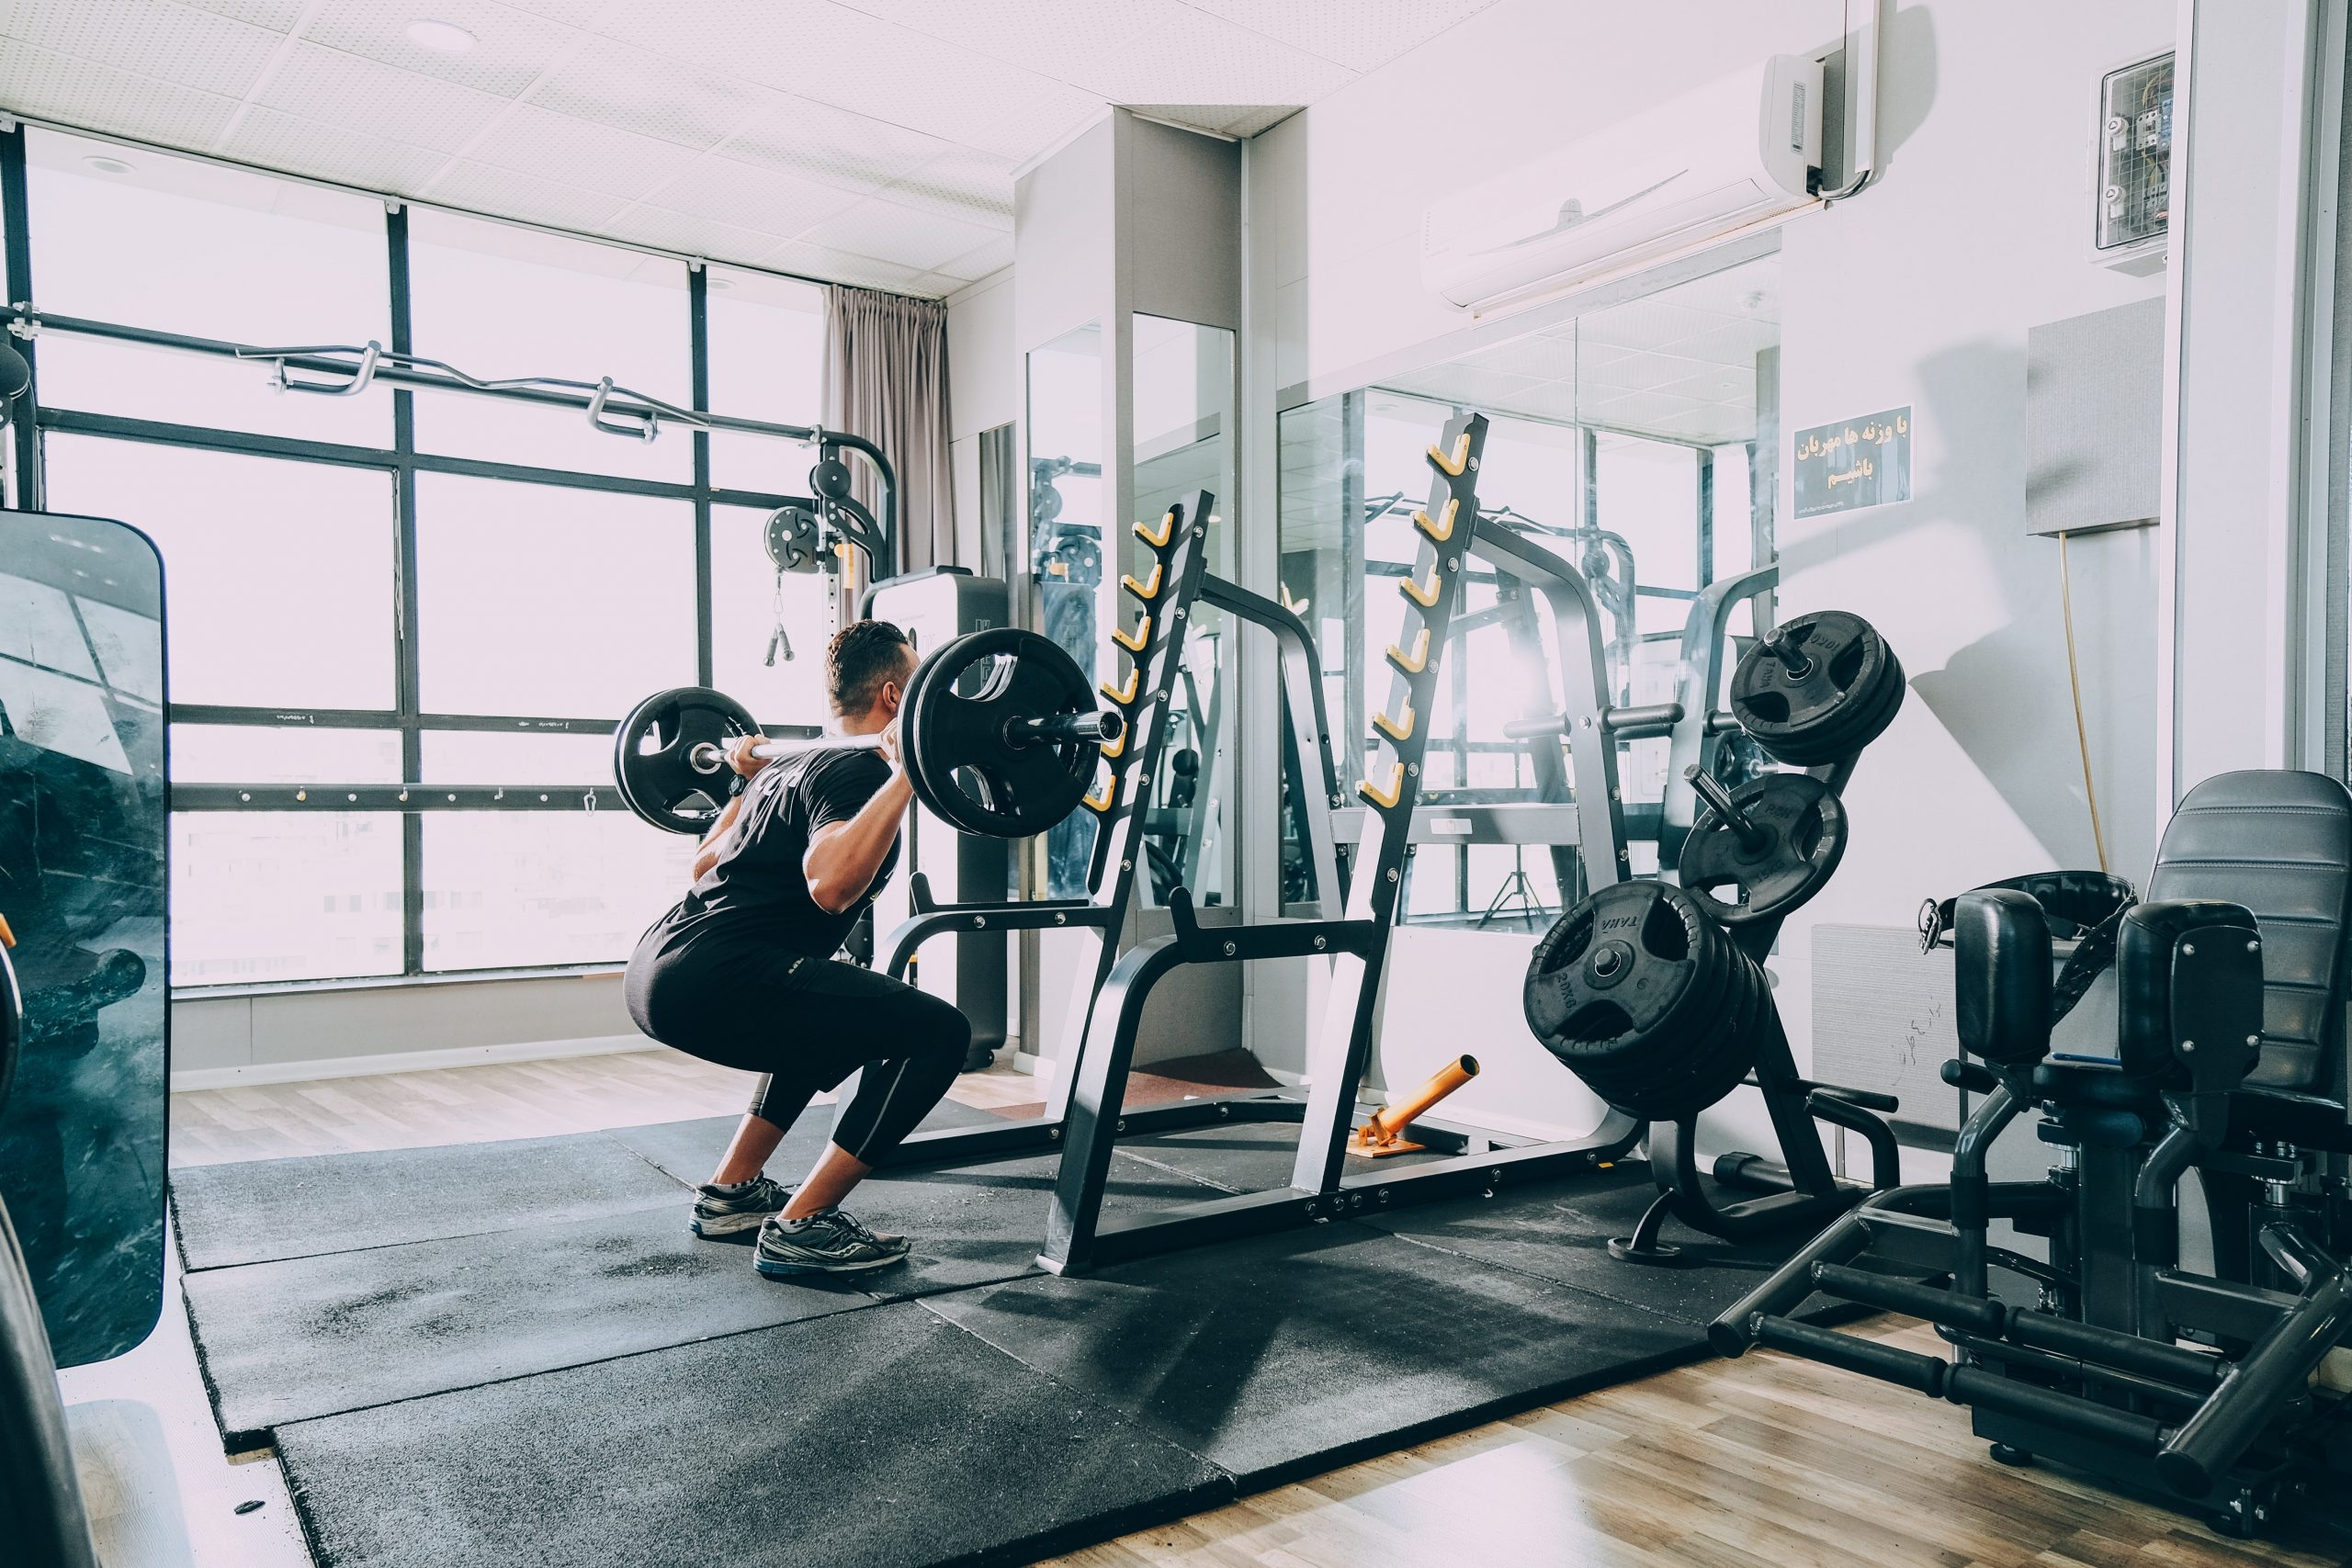 Guy doing squats | Pivotal Motion